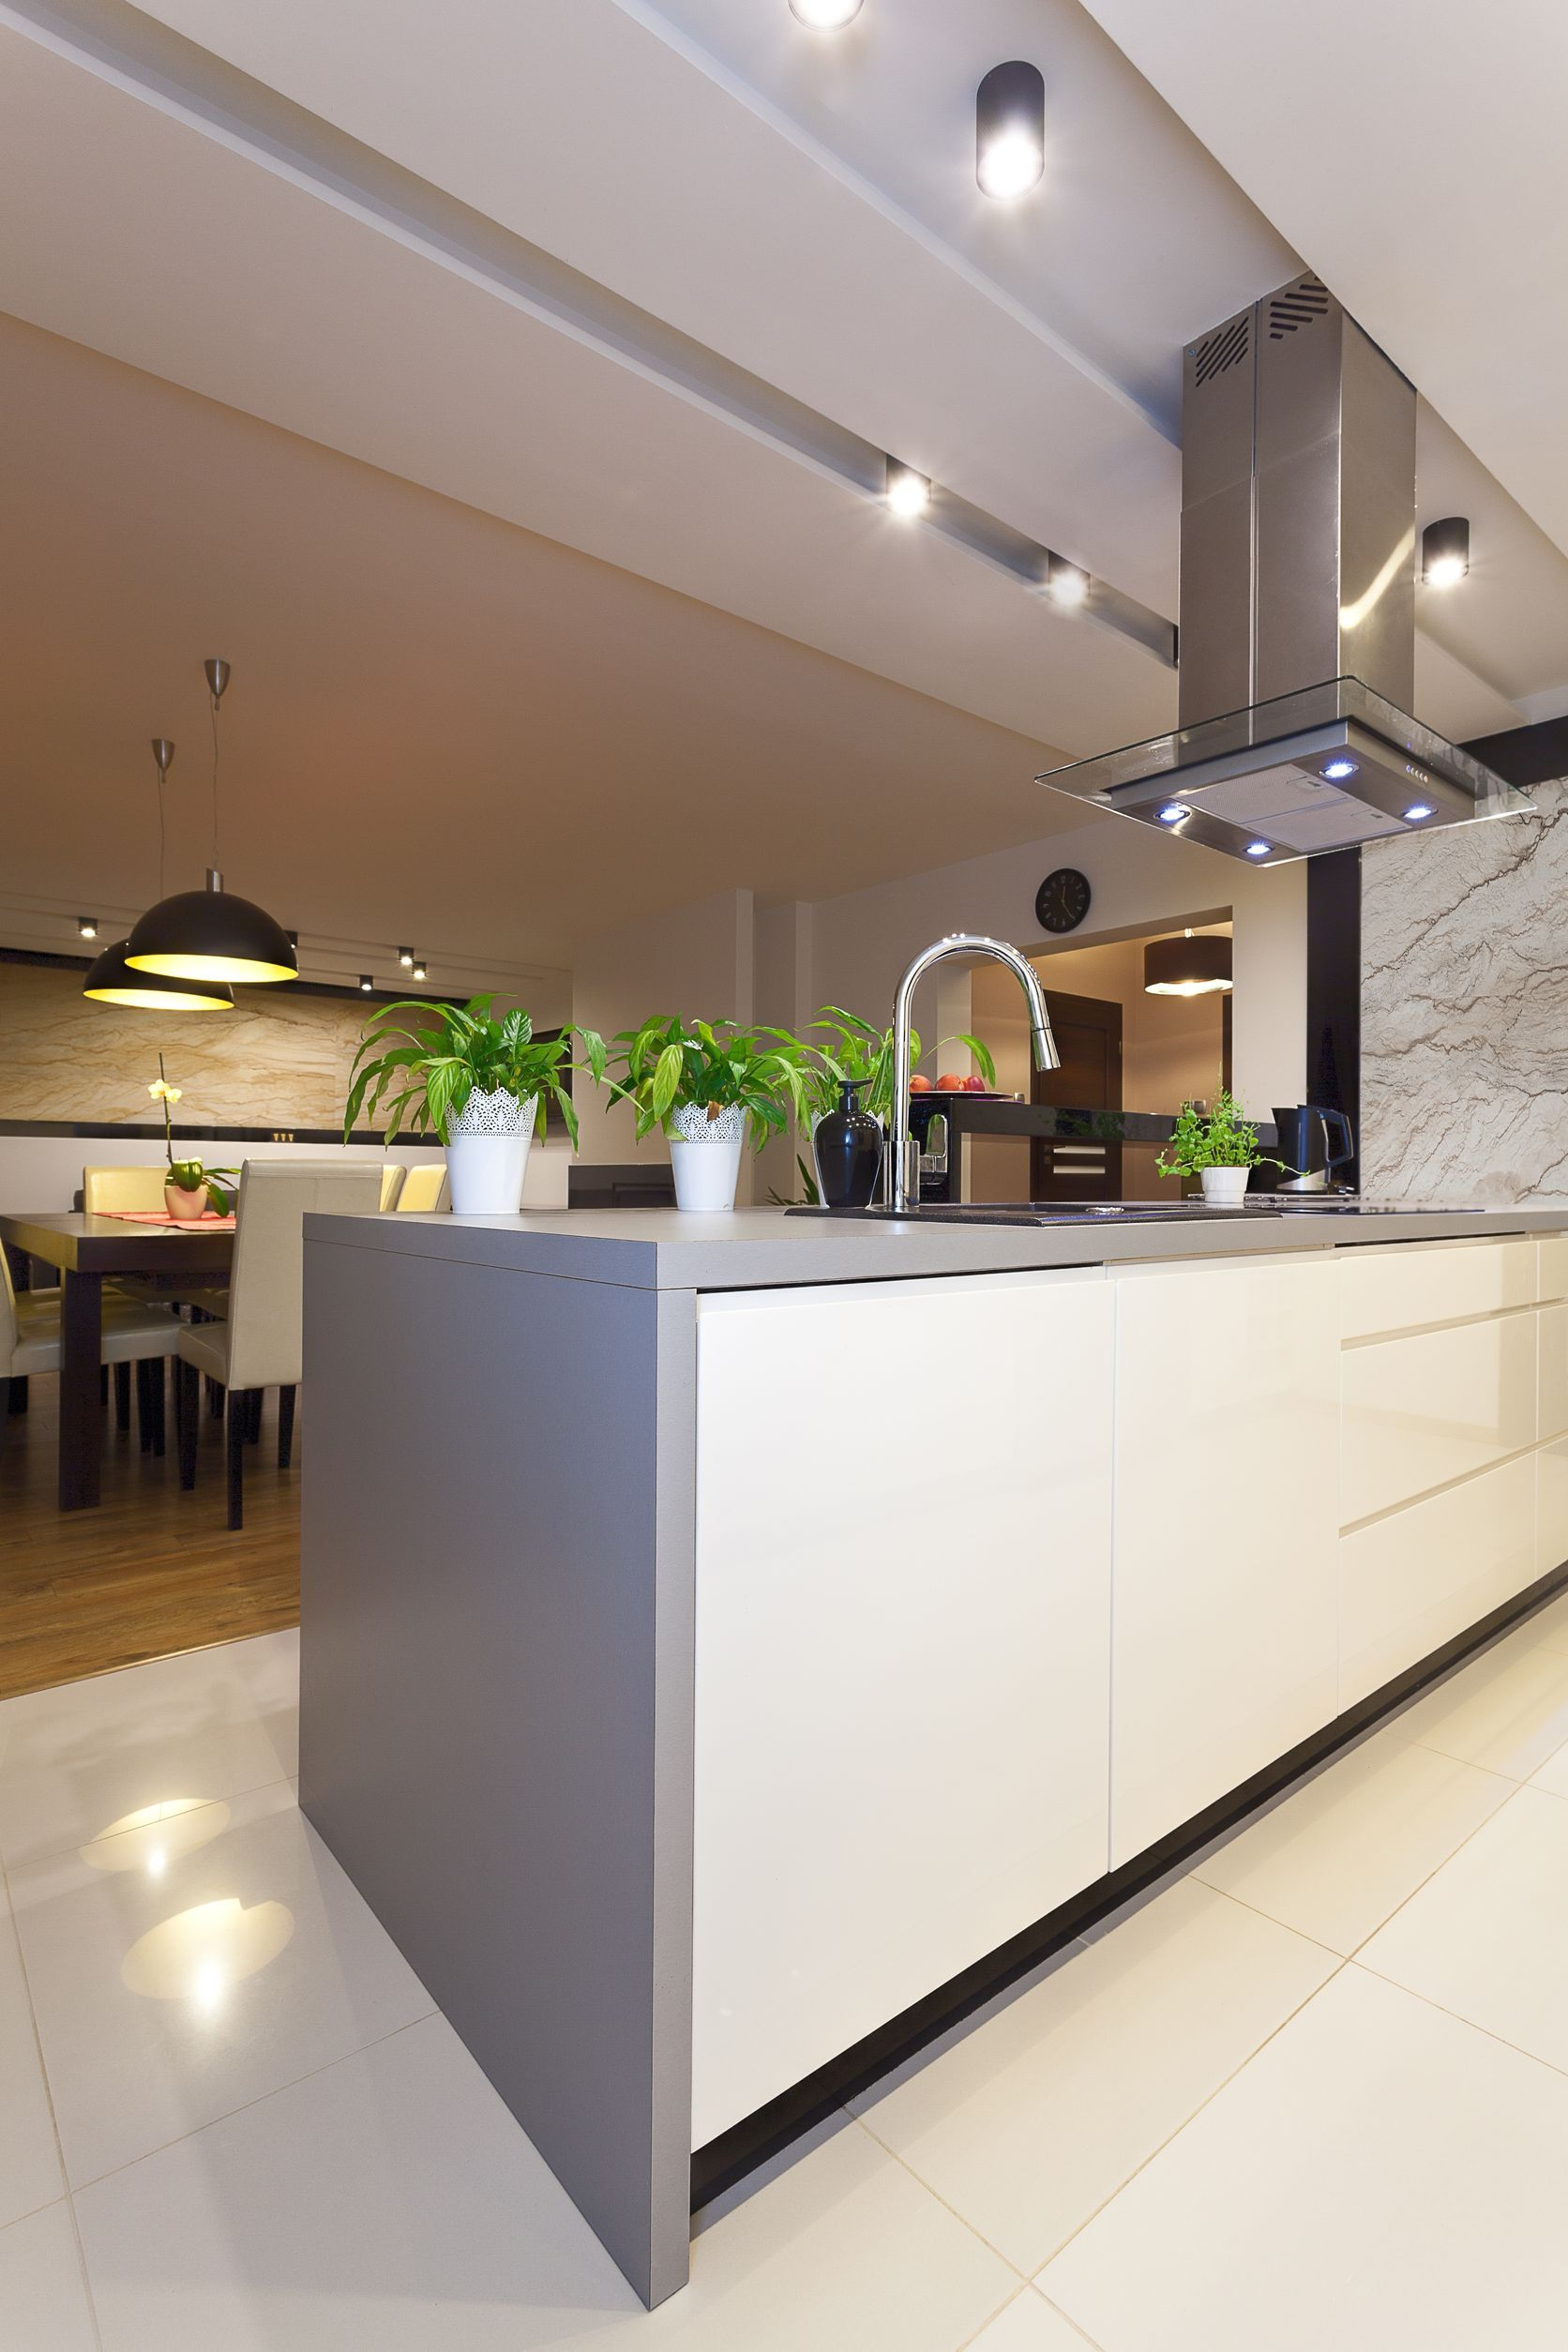 pinartistic kitchens  more llc on 2017  2018 kitchen